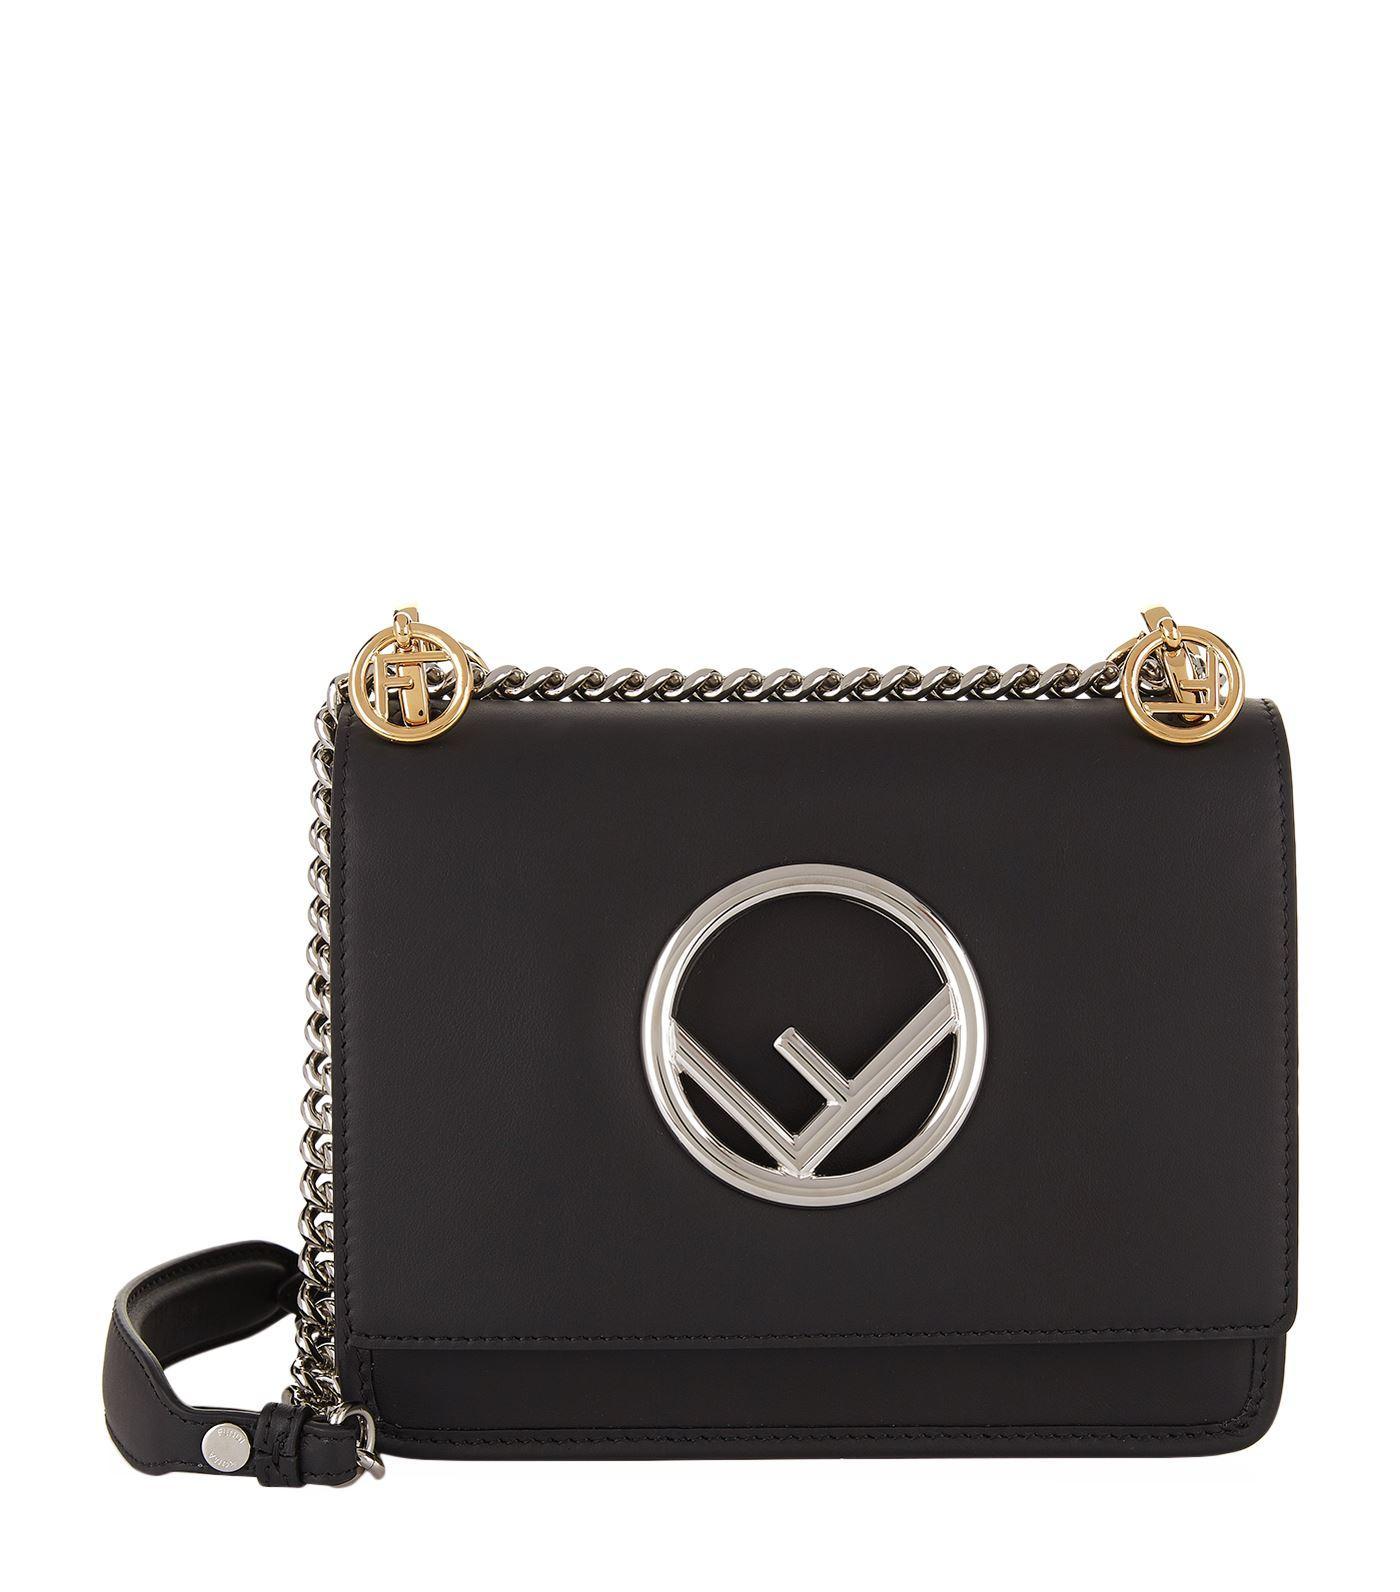 5e13431b19 Fendi Medium Kan I Leather Shoulder Bag